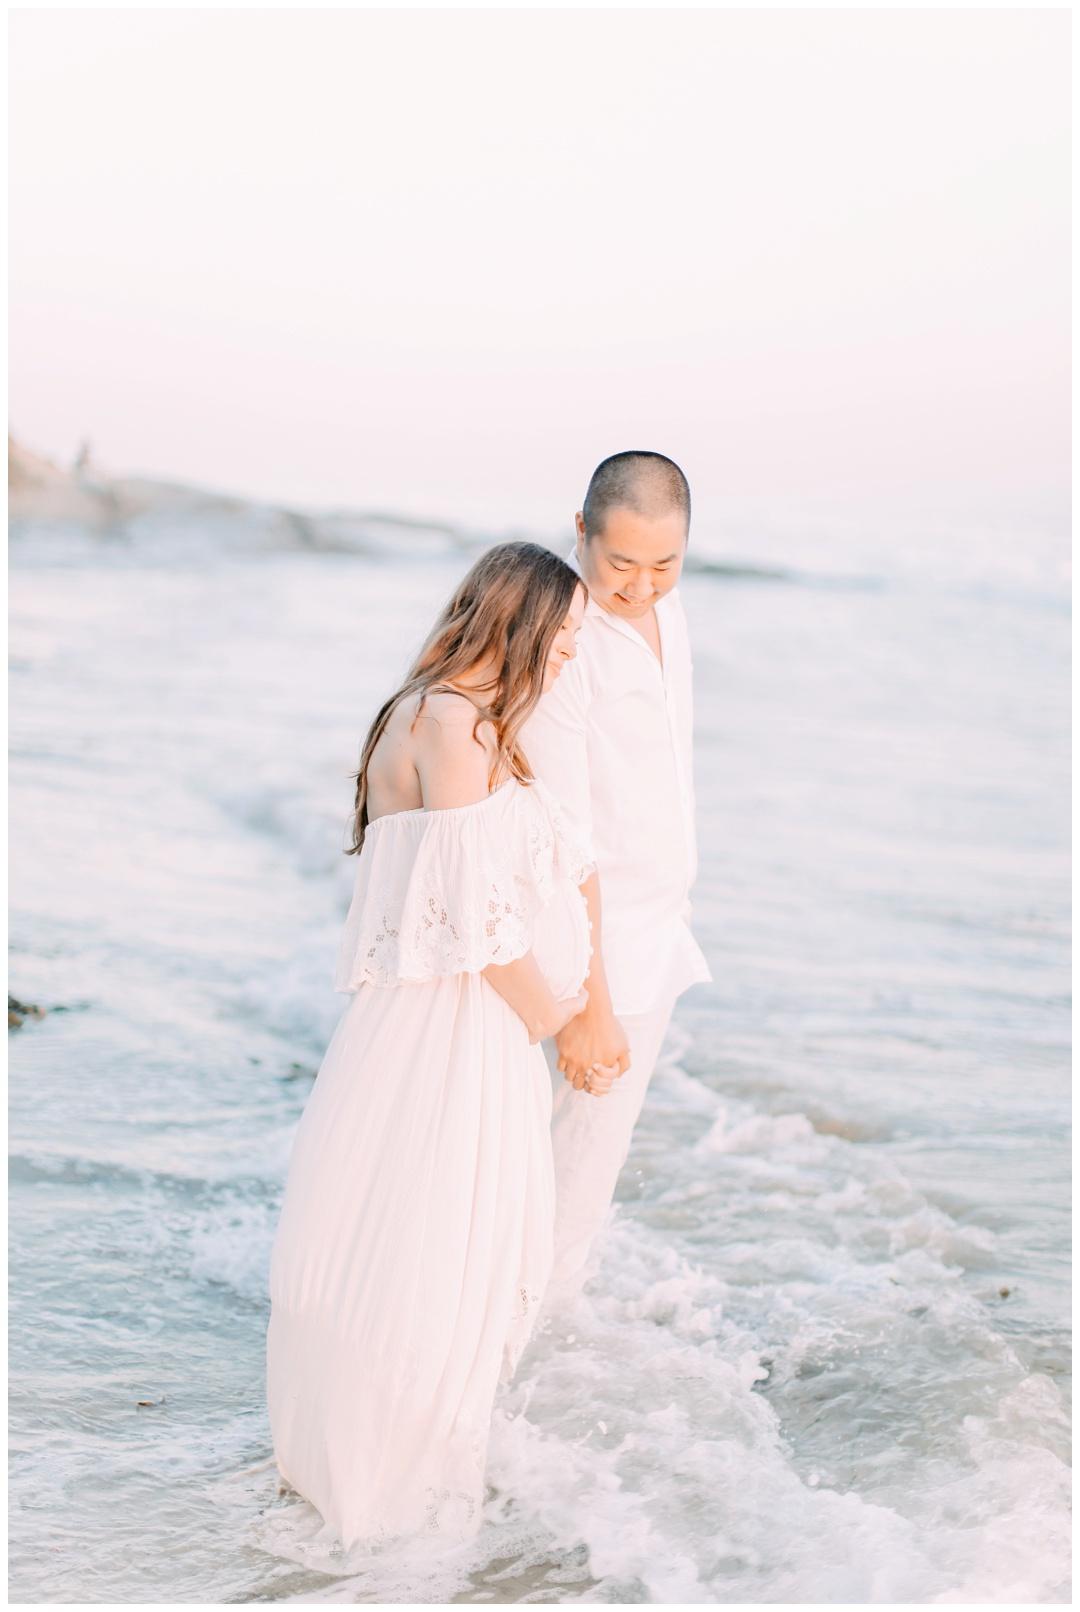 Newport_Beach_Maternity_Photographer_Beach_Maternity_Photography_Cori_Kleckner_Photography_1004.jpg